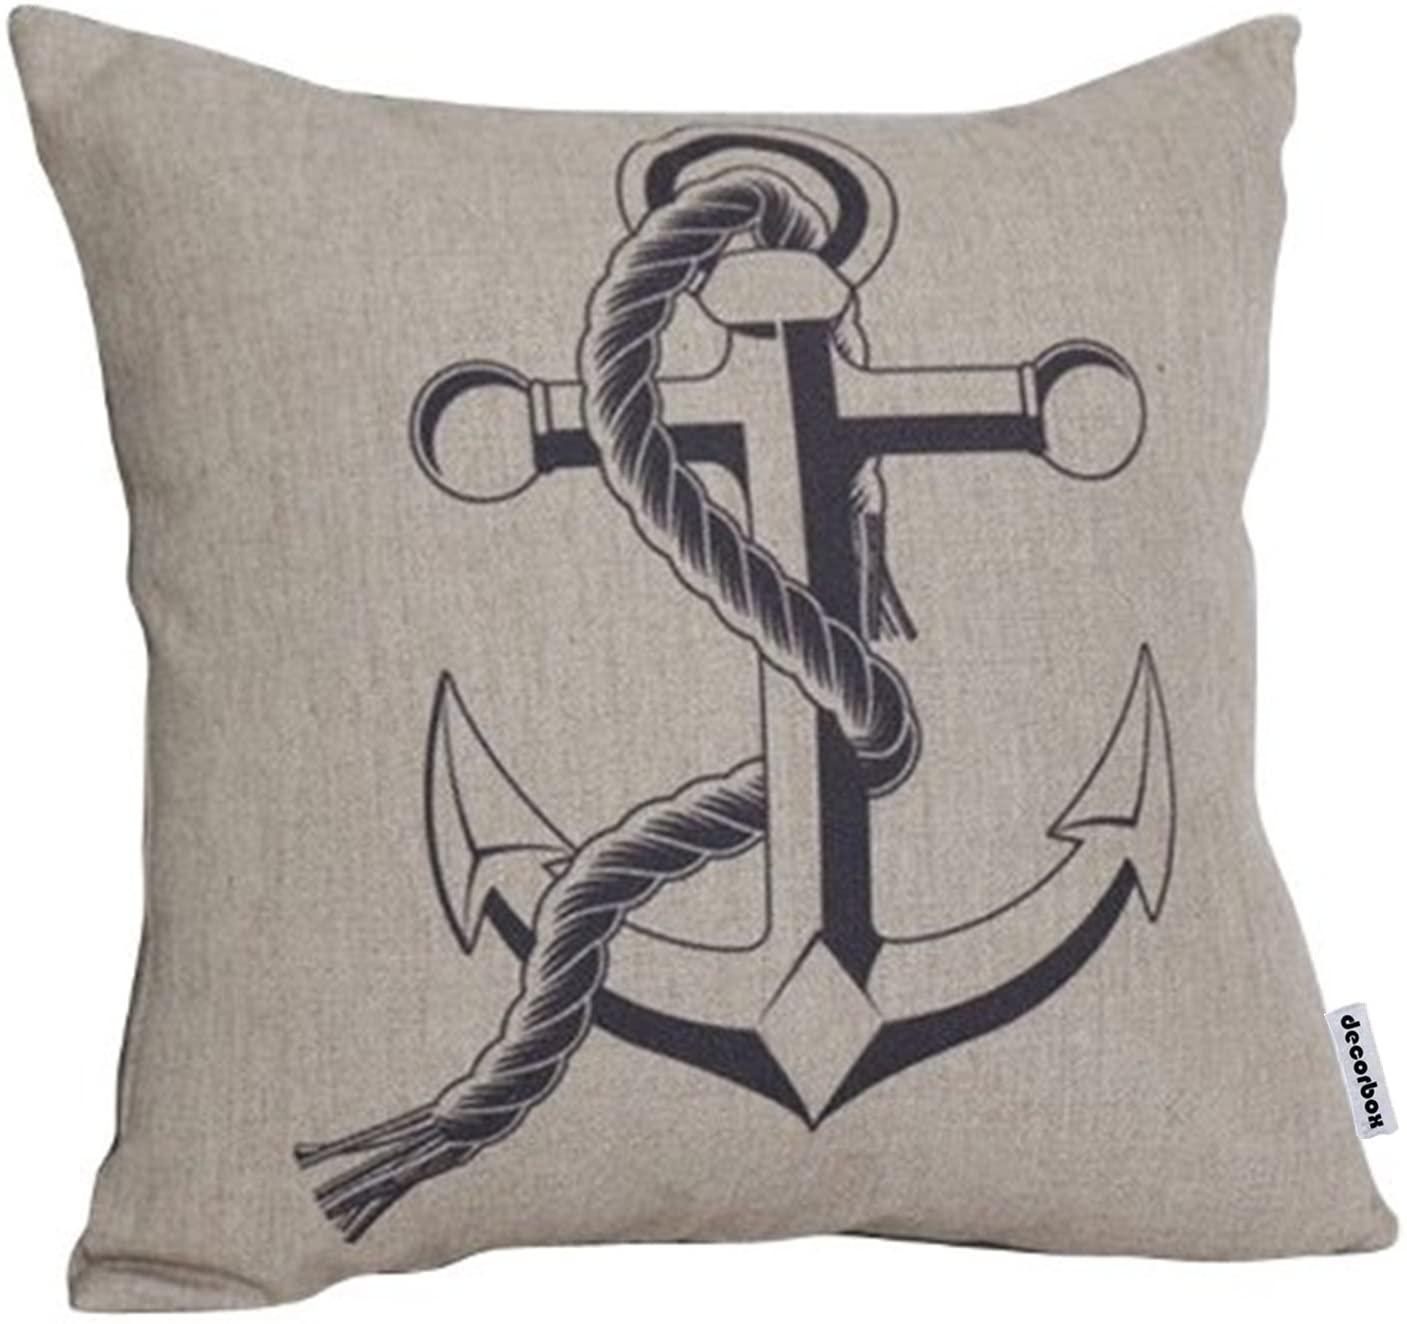 Decorbox Cotton Linen Decorative Throw Pillow Cushion Case Anchor Cushion Cover 18 x 18